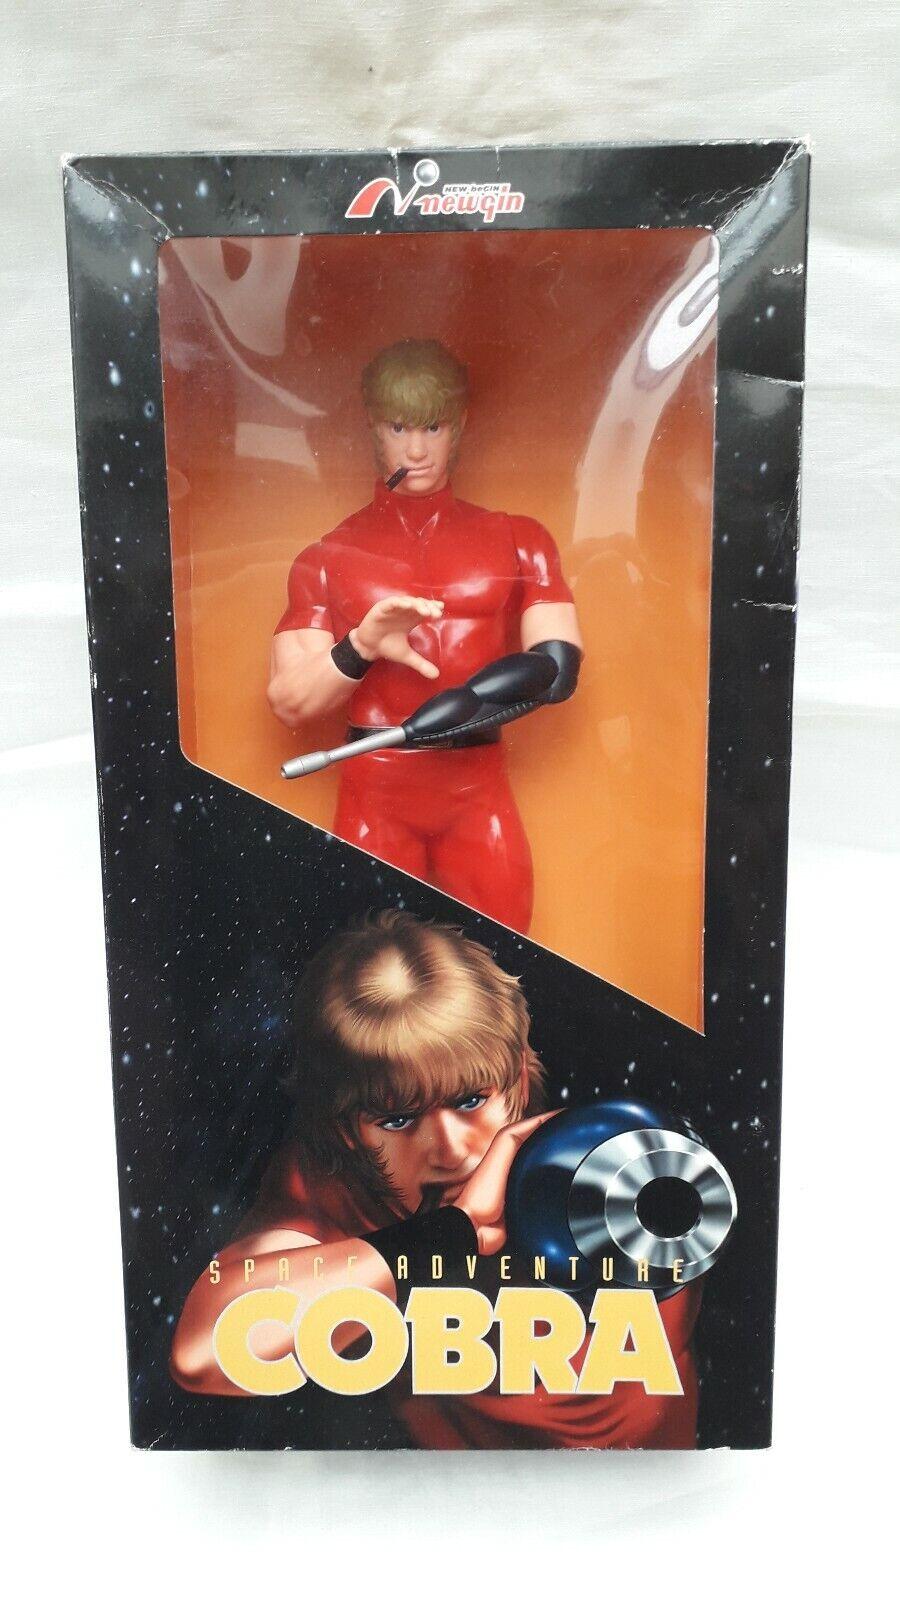 Figurine Deluxe Space Adventure Cobra no oroorak Albator Ulysse 31 Popy